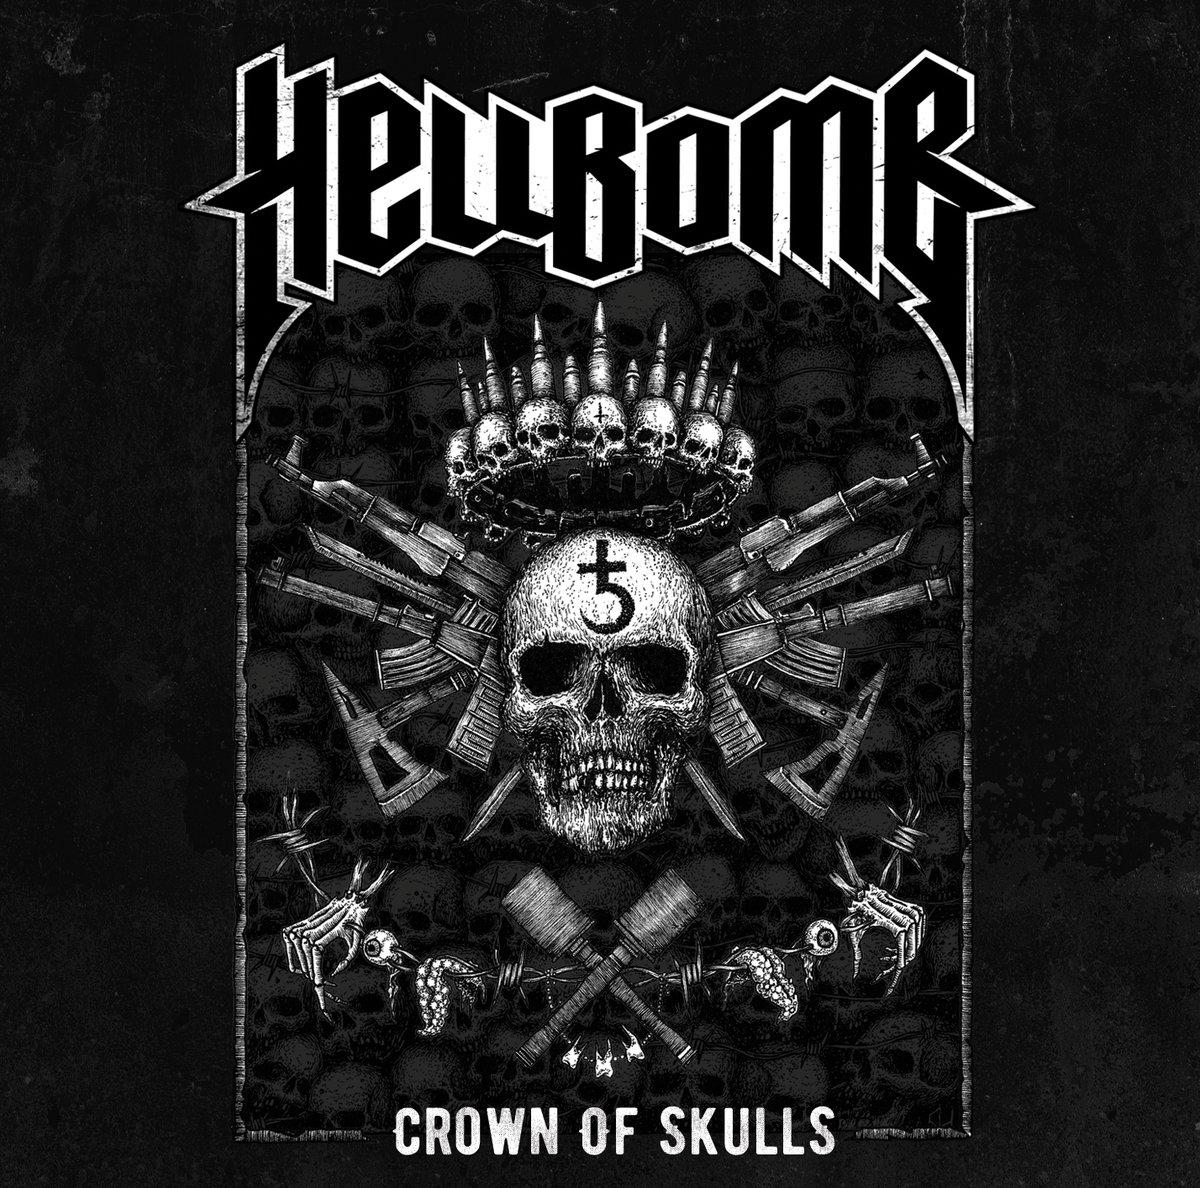 Hellbomb - Hardcore Blackened war